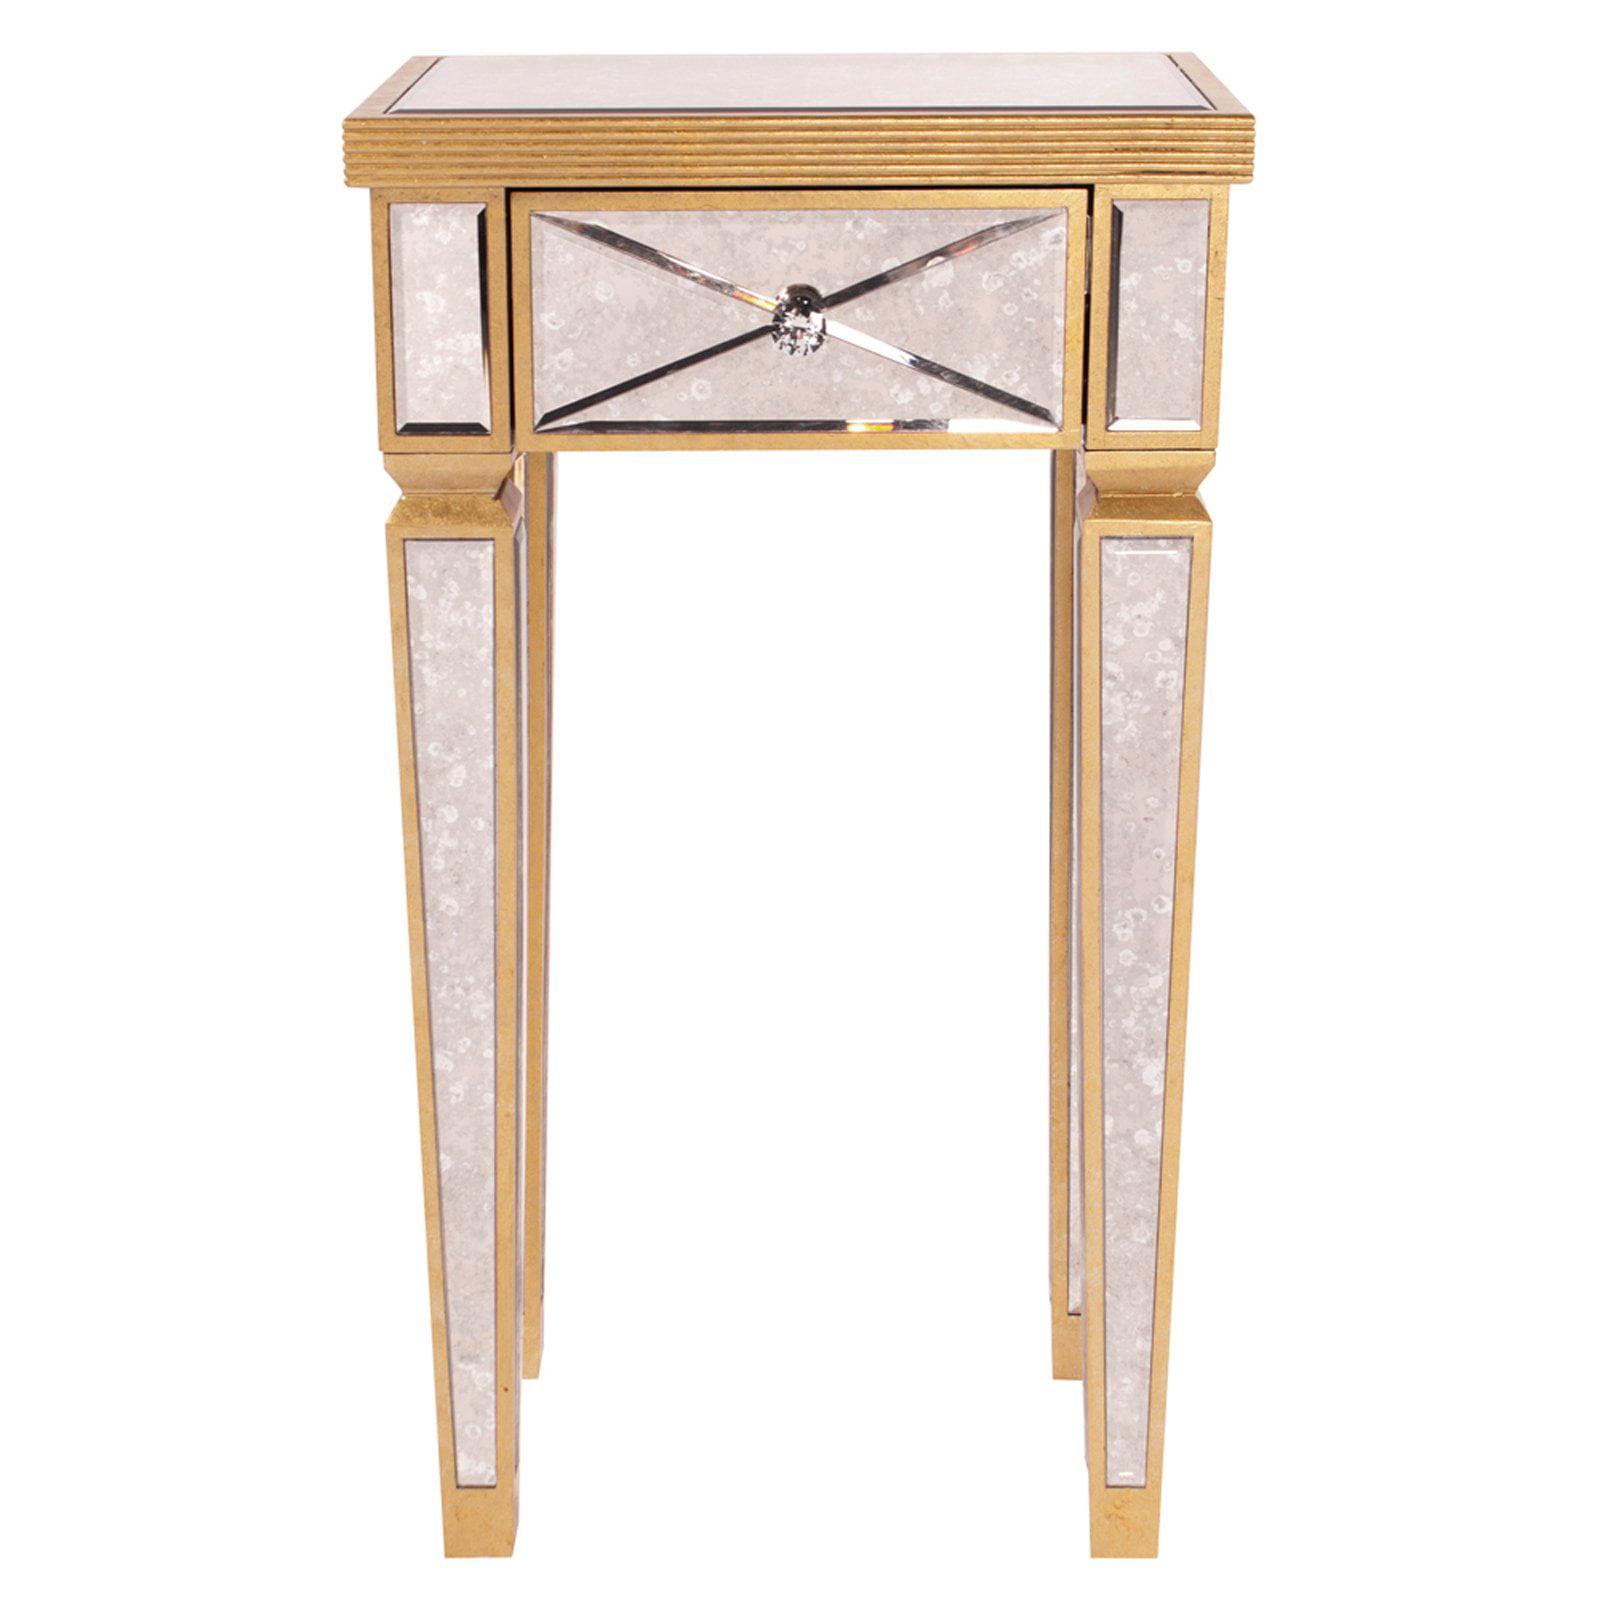 Elizabeth Austin Antique Gold Mirrored Pedestal Table by Howard Elliott